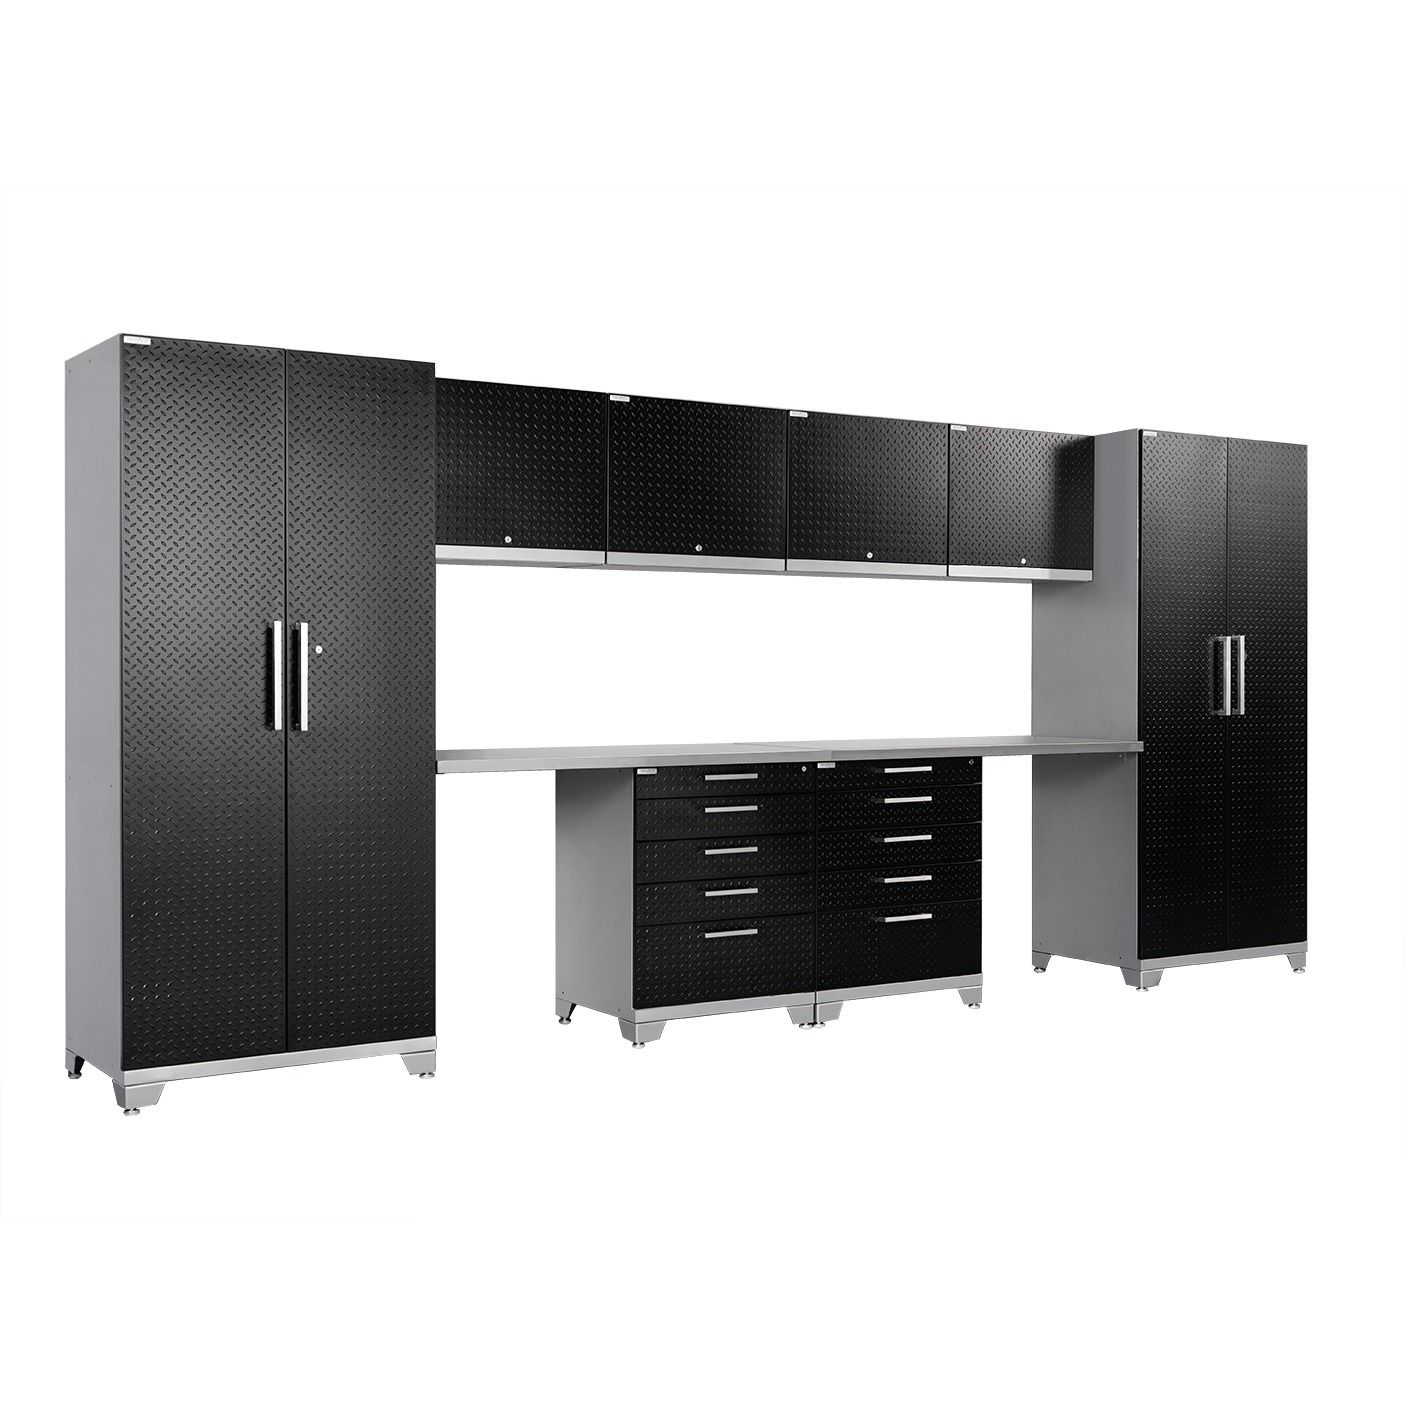 NewAge Products Performance Plus Diamond Plate 10 Piece Metal Cabinet Set (